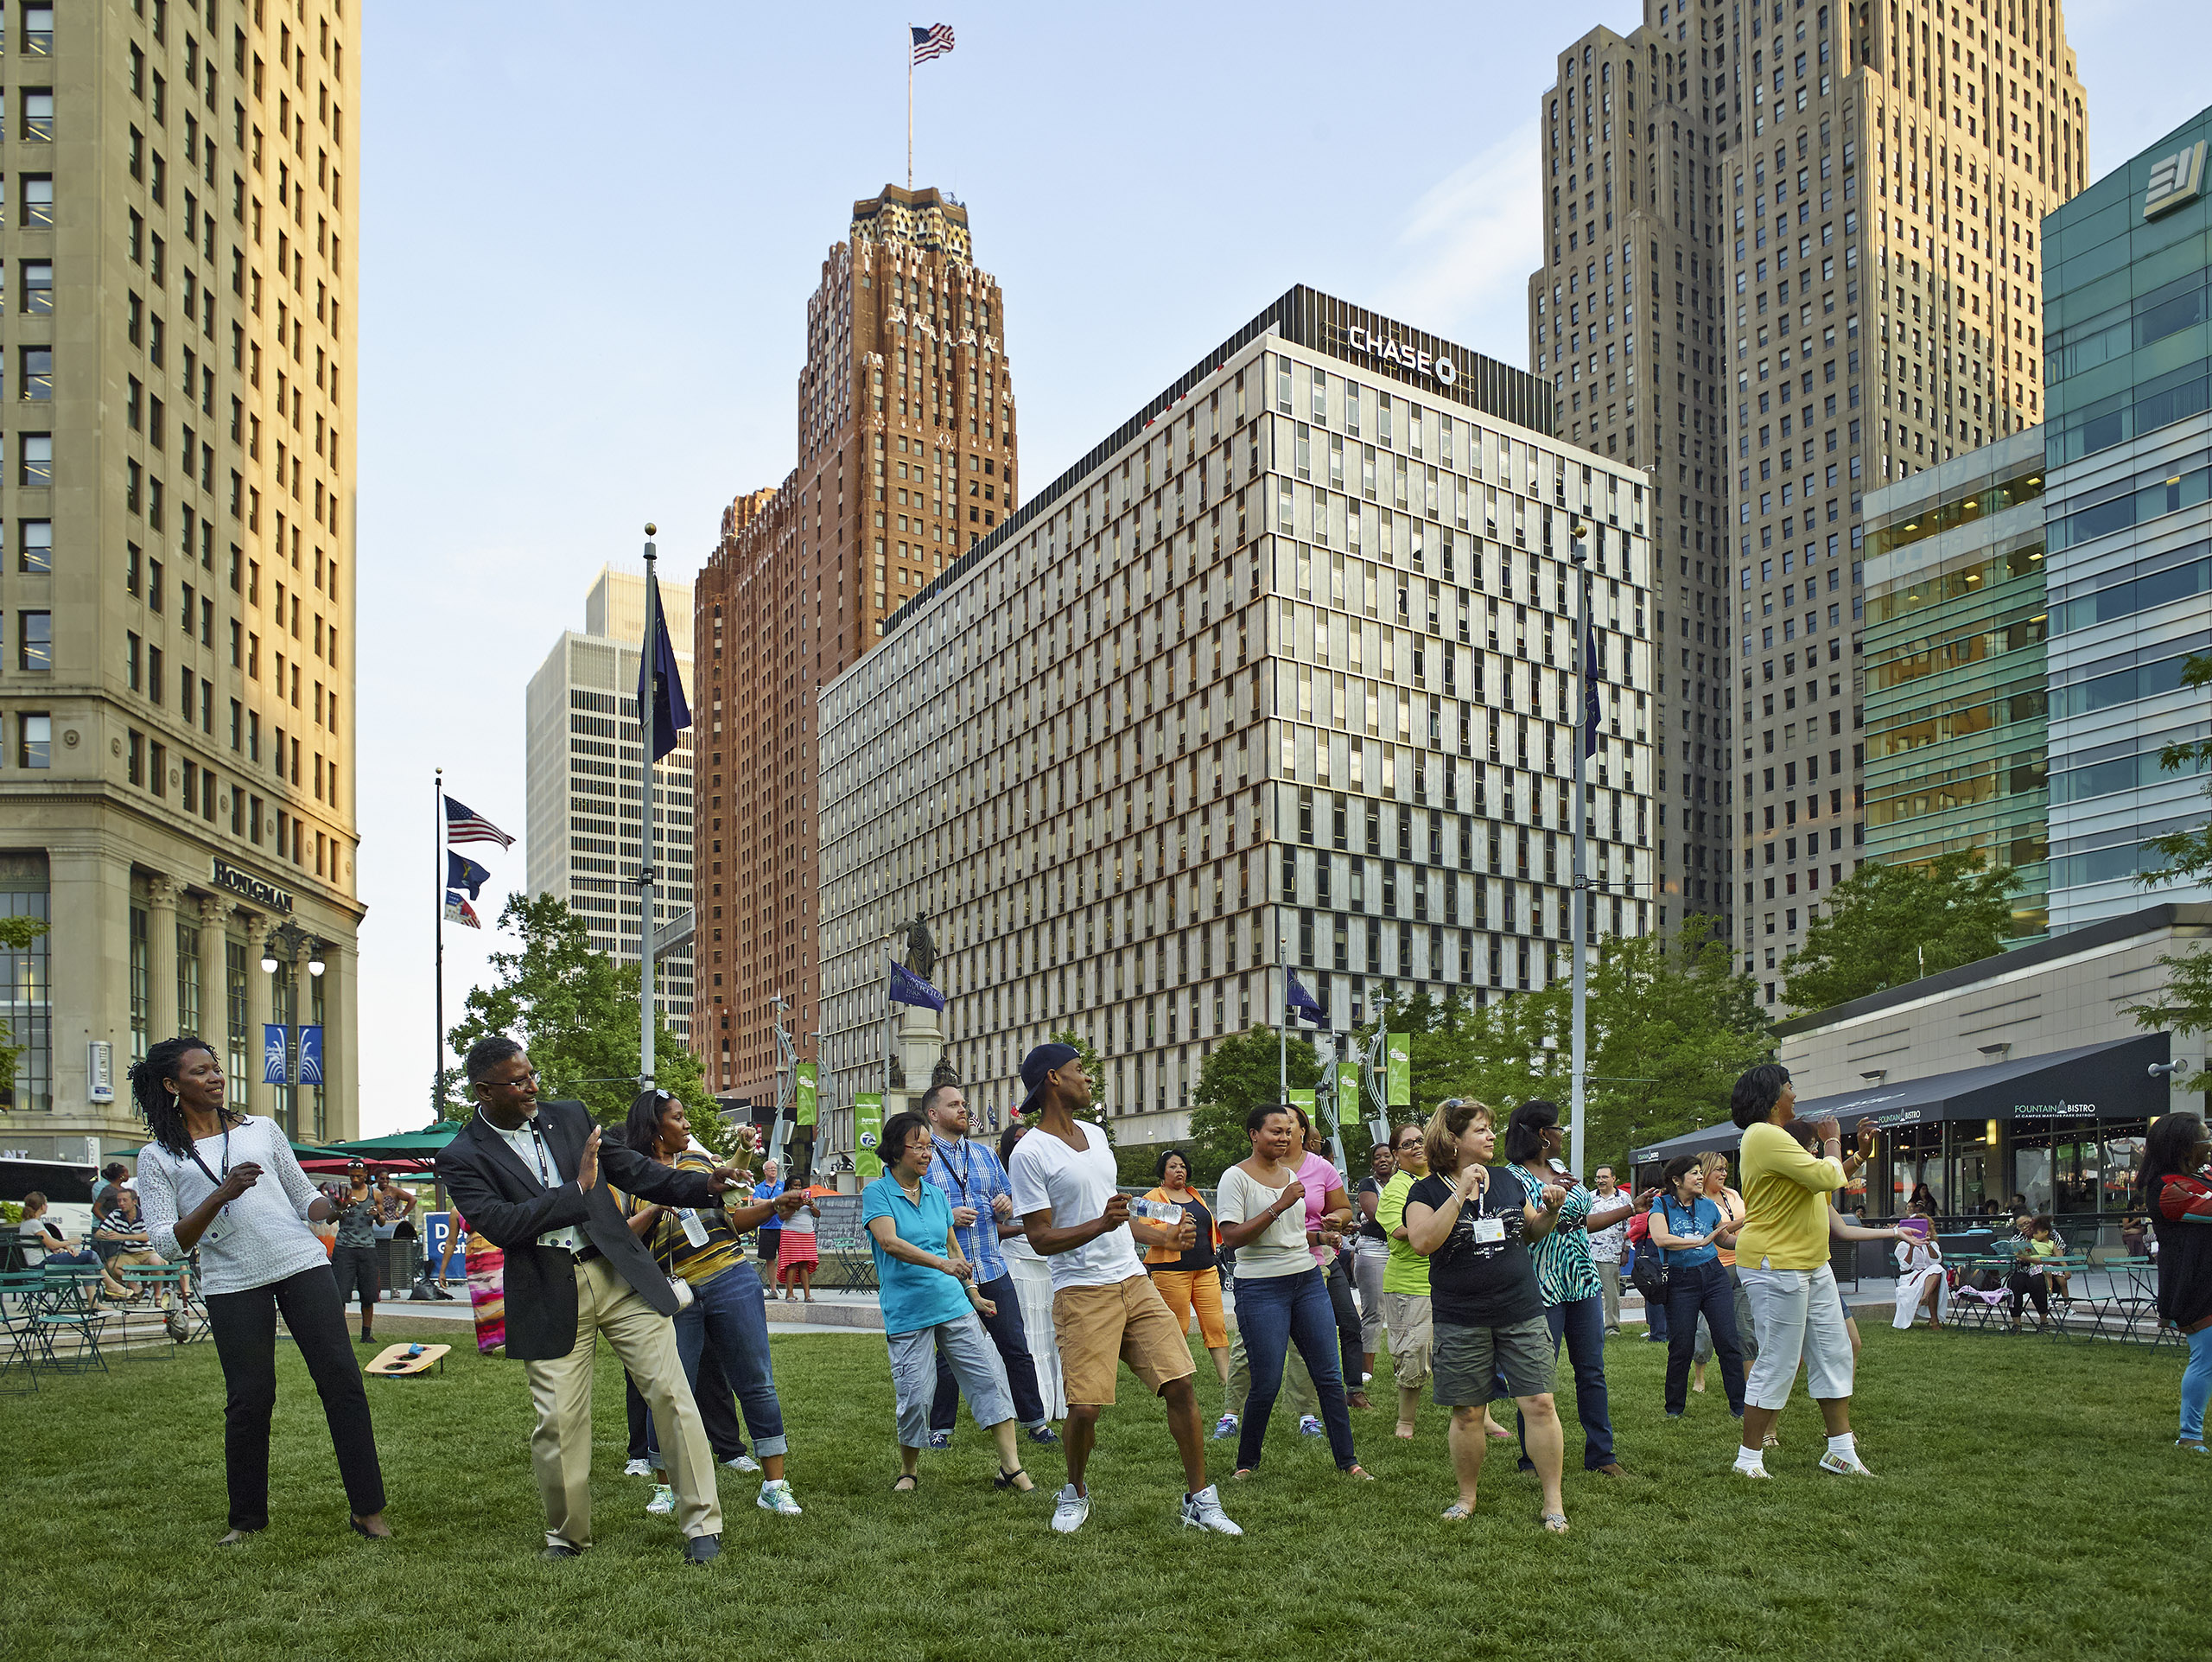 A group of diversity activists celebrate at a downtownDetroit park